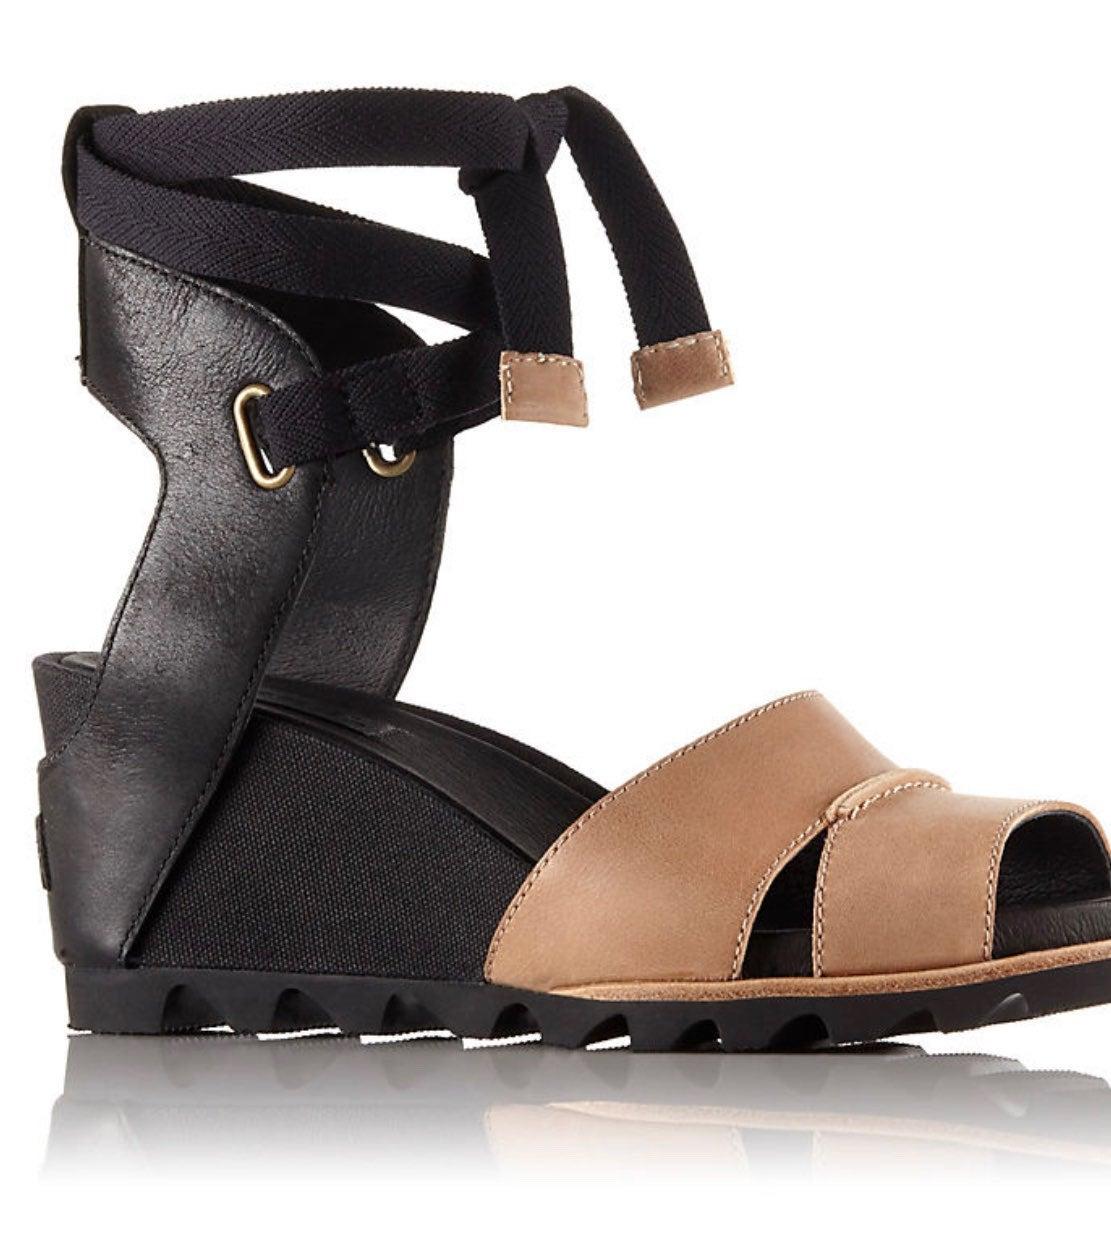 SOREL Joanie Wrap Wedge Sandal